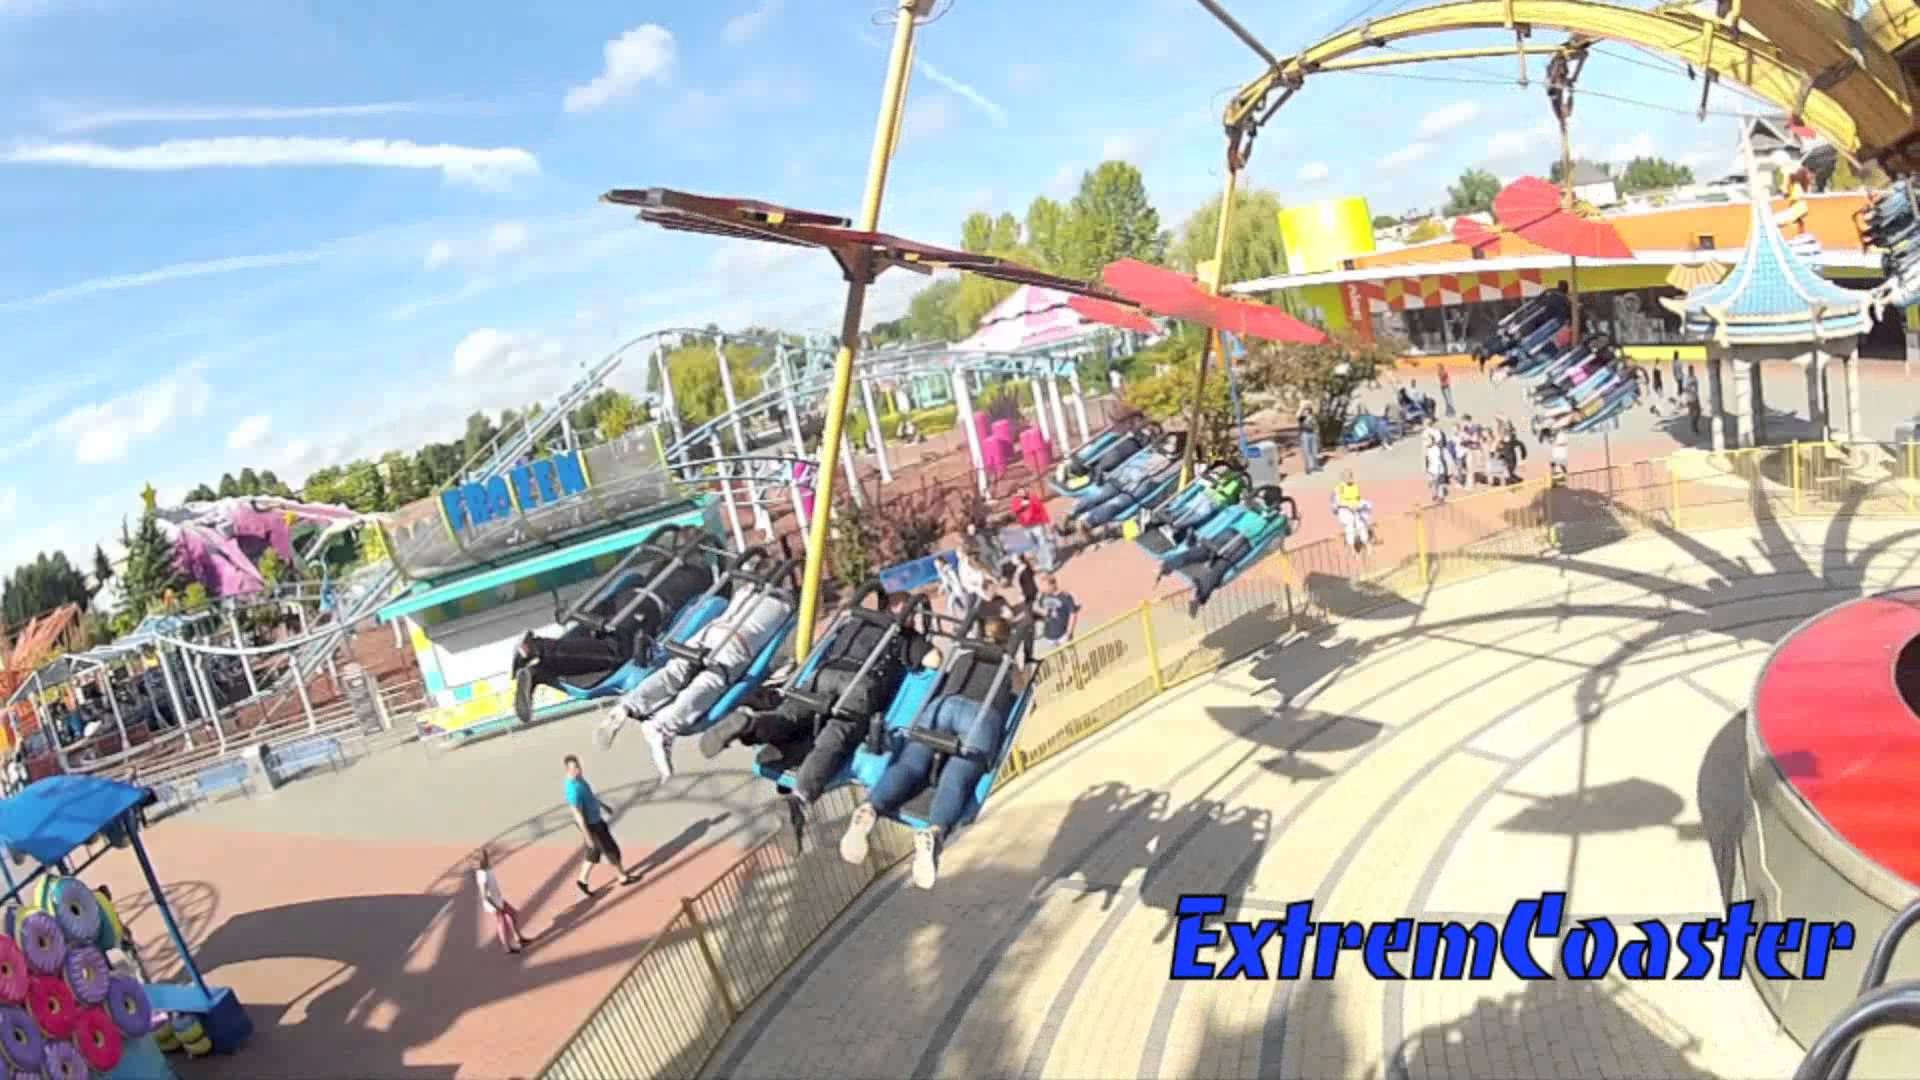 Avatar Air Glider On Ride Movie Park Germany Hd Ride Movie Park Germany